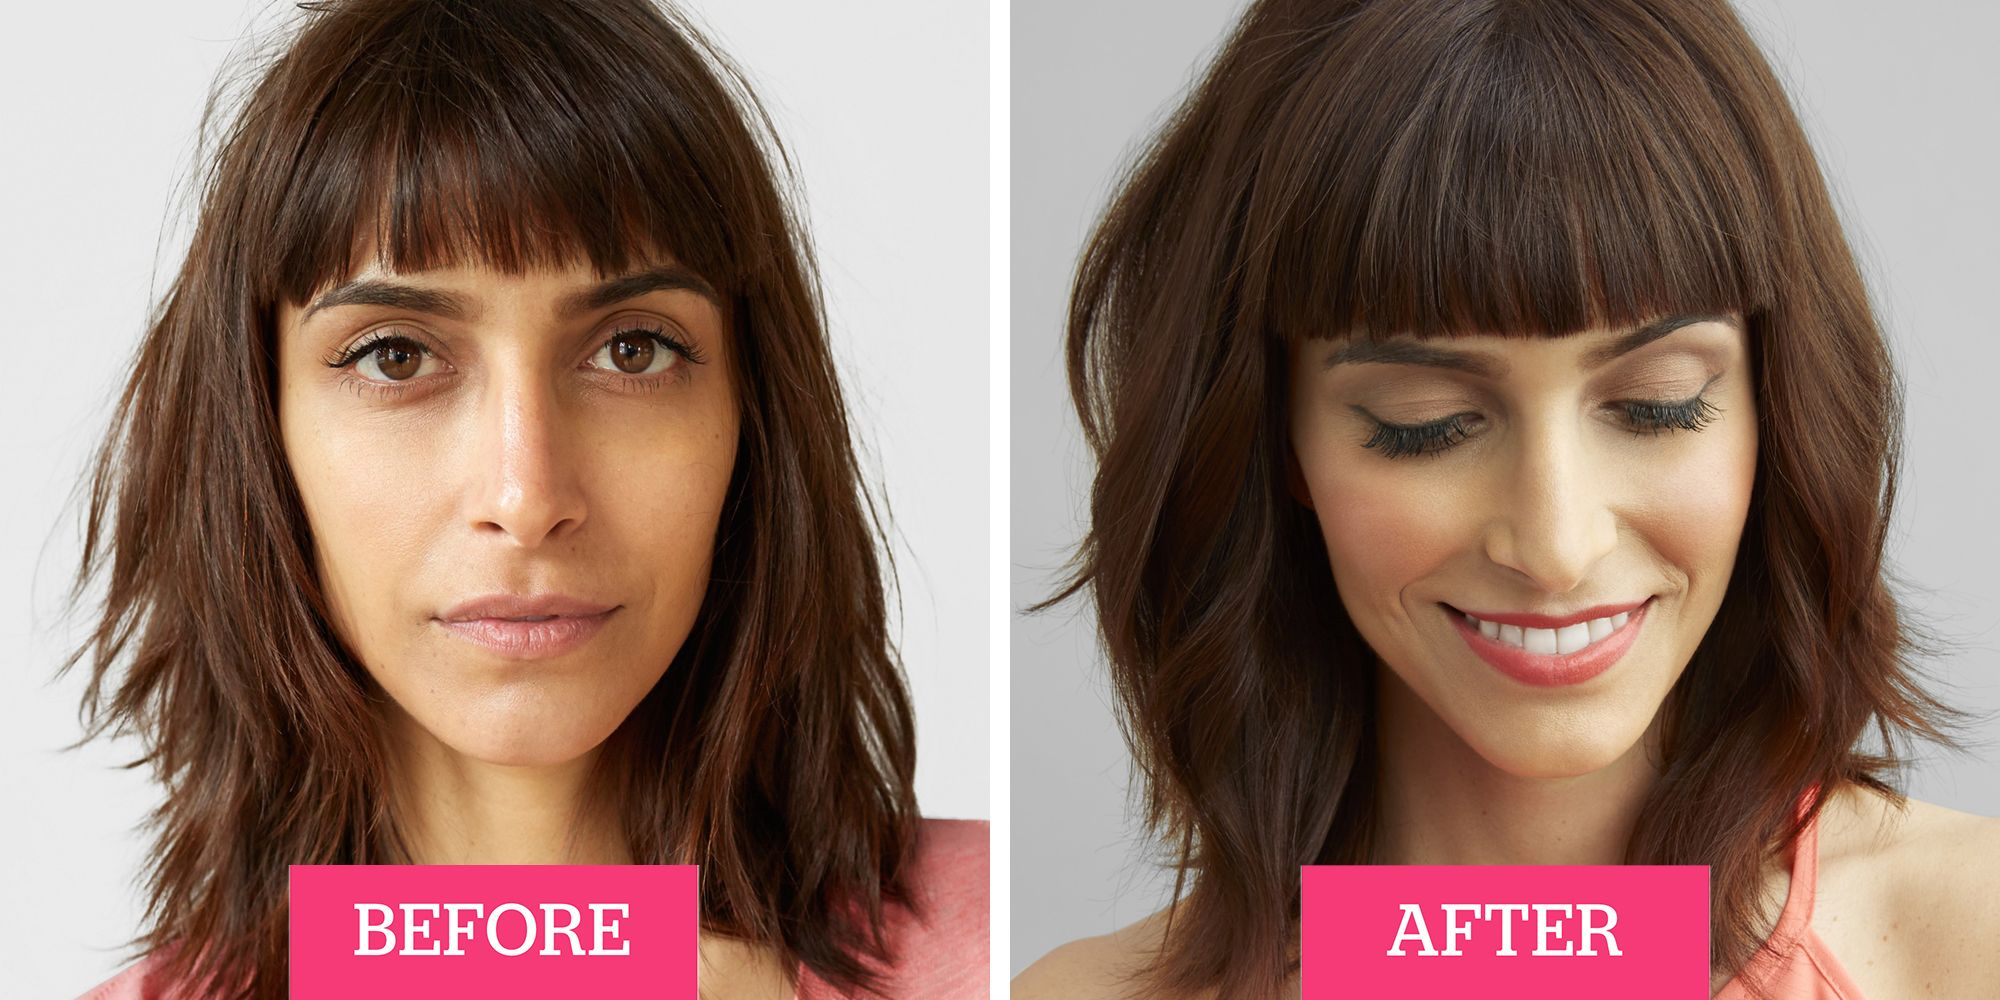 5 Minute Fix: Freshen Up Dirty Hair 5 Minute Fix: Freshen Up Dirty Hair new pictures